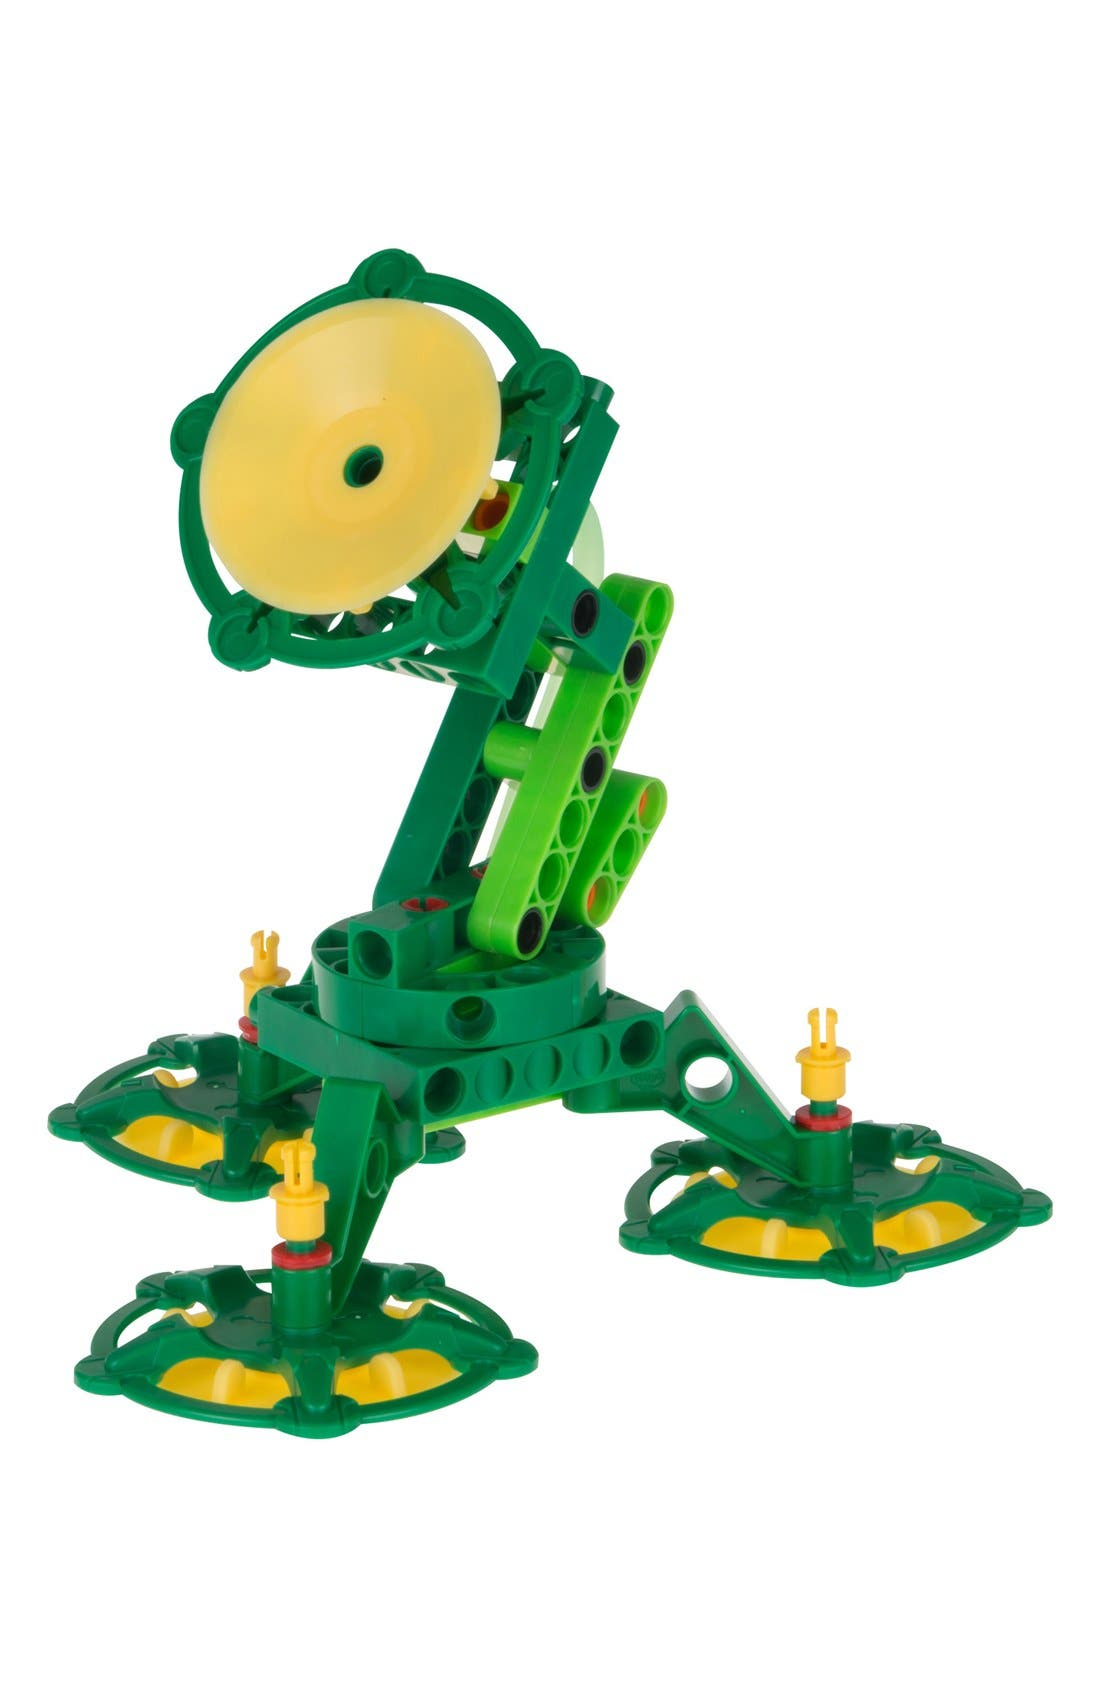 'Geckobot' Robotics Experiment Kit,                             Alternate thumbnail 4, color,                             301